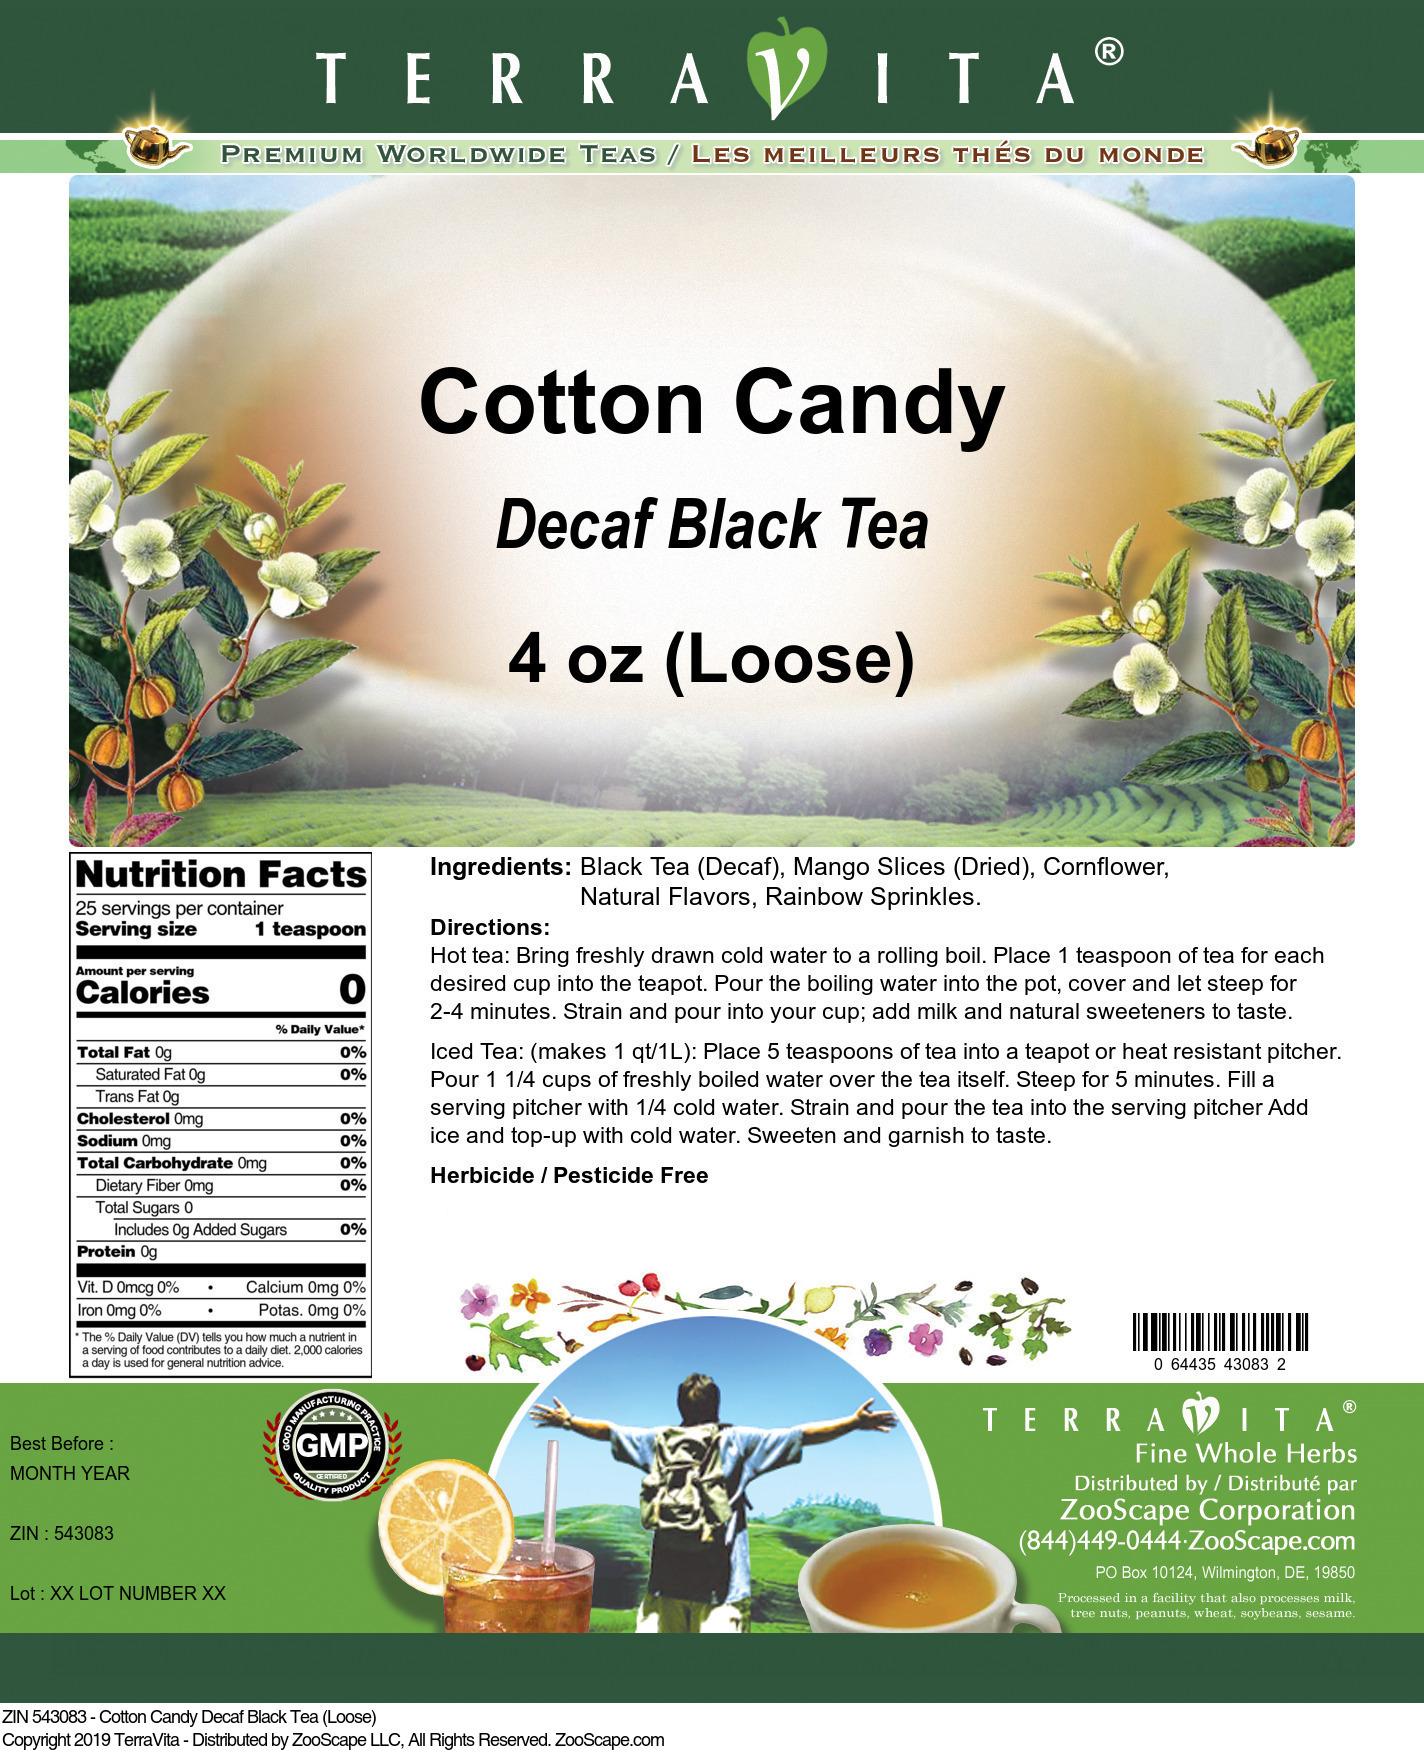 Cotton Candy Decaf Black Tea (Loose)